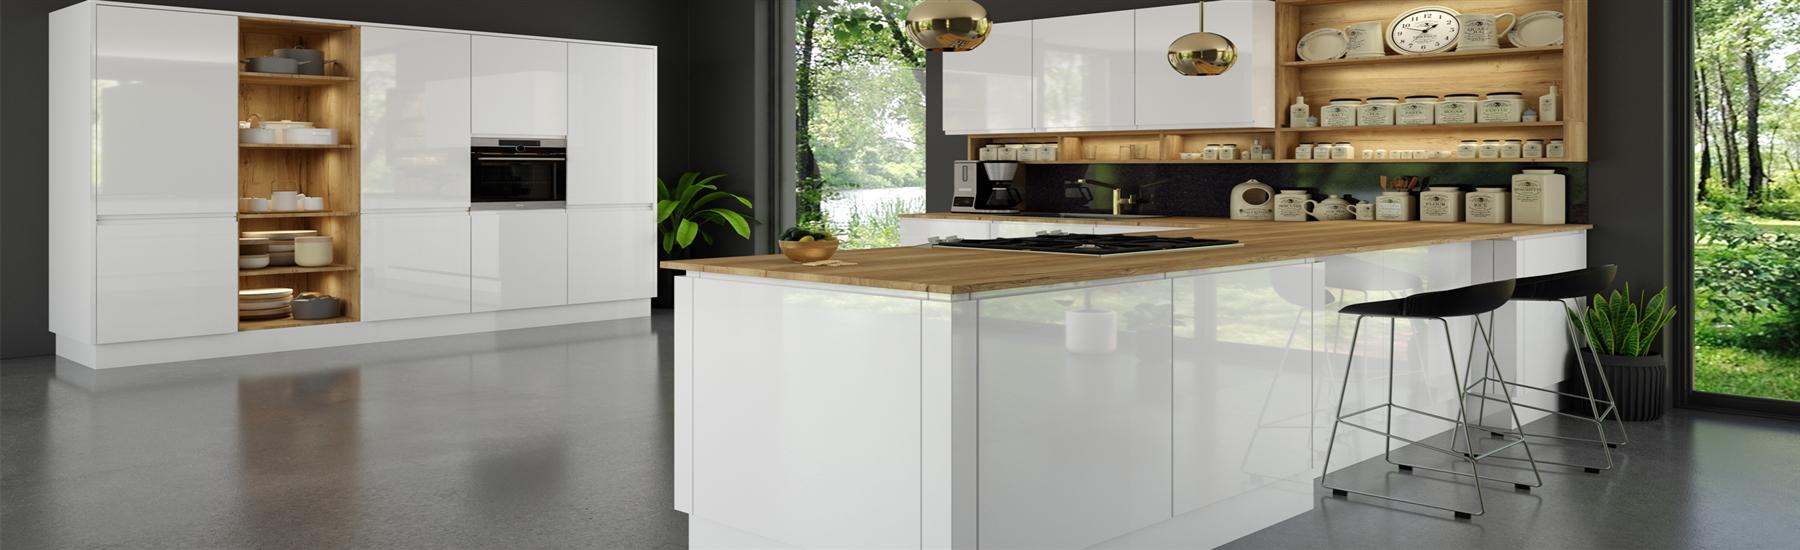 jayline-kitchen-doors